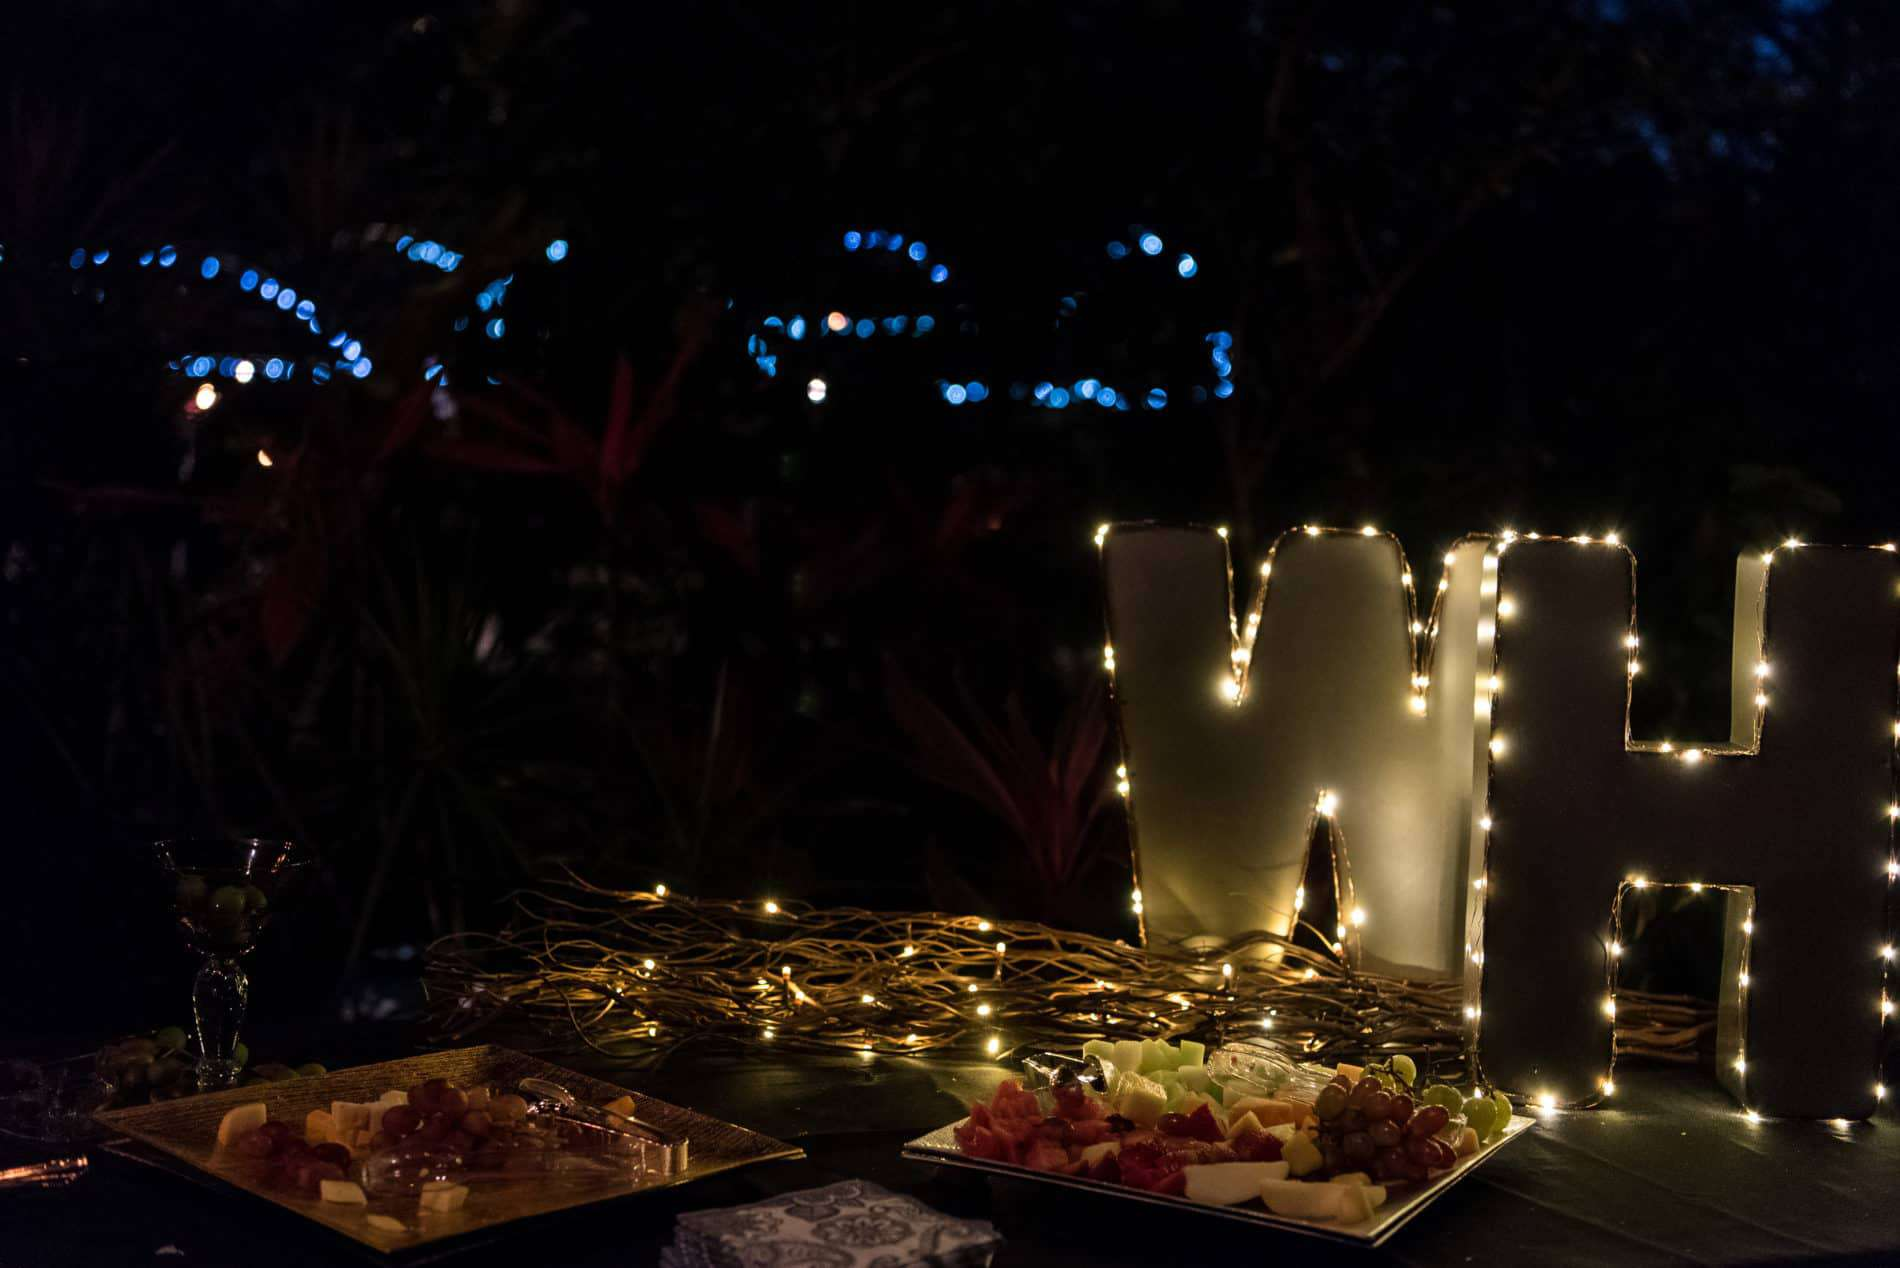 Nighttime outdoor wedding reception details